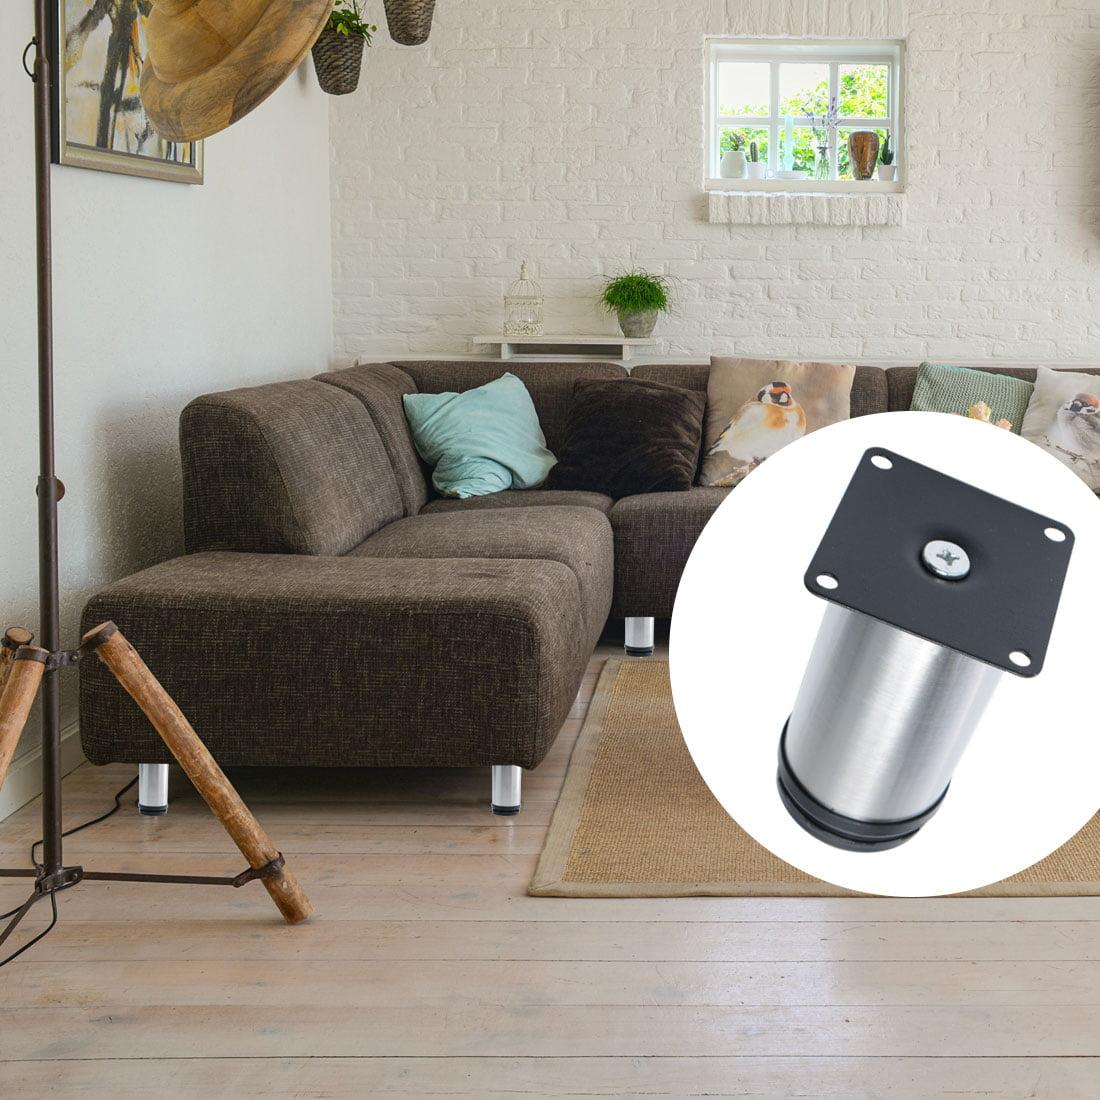 Sofa//Table//Cabinets//Shelves Adjustable Stainless Steel Metal Furniture Leg LH